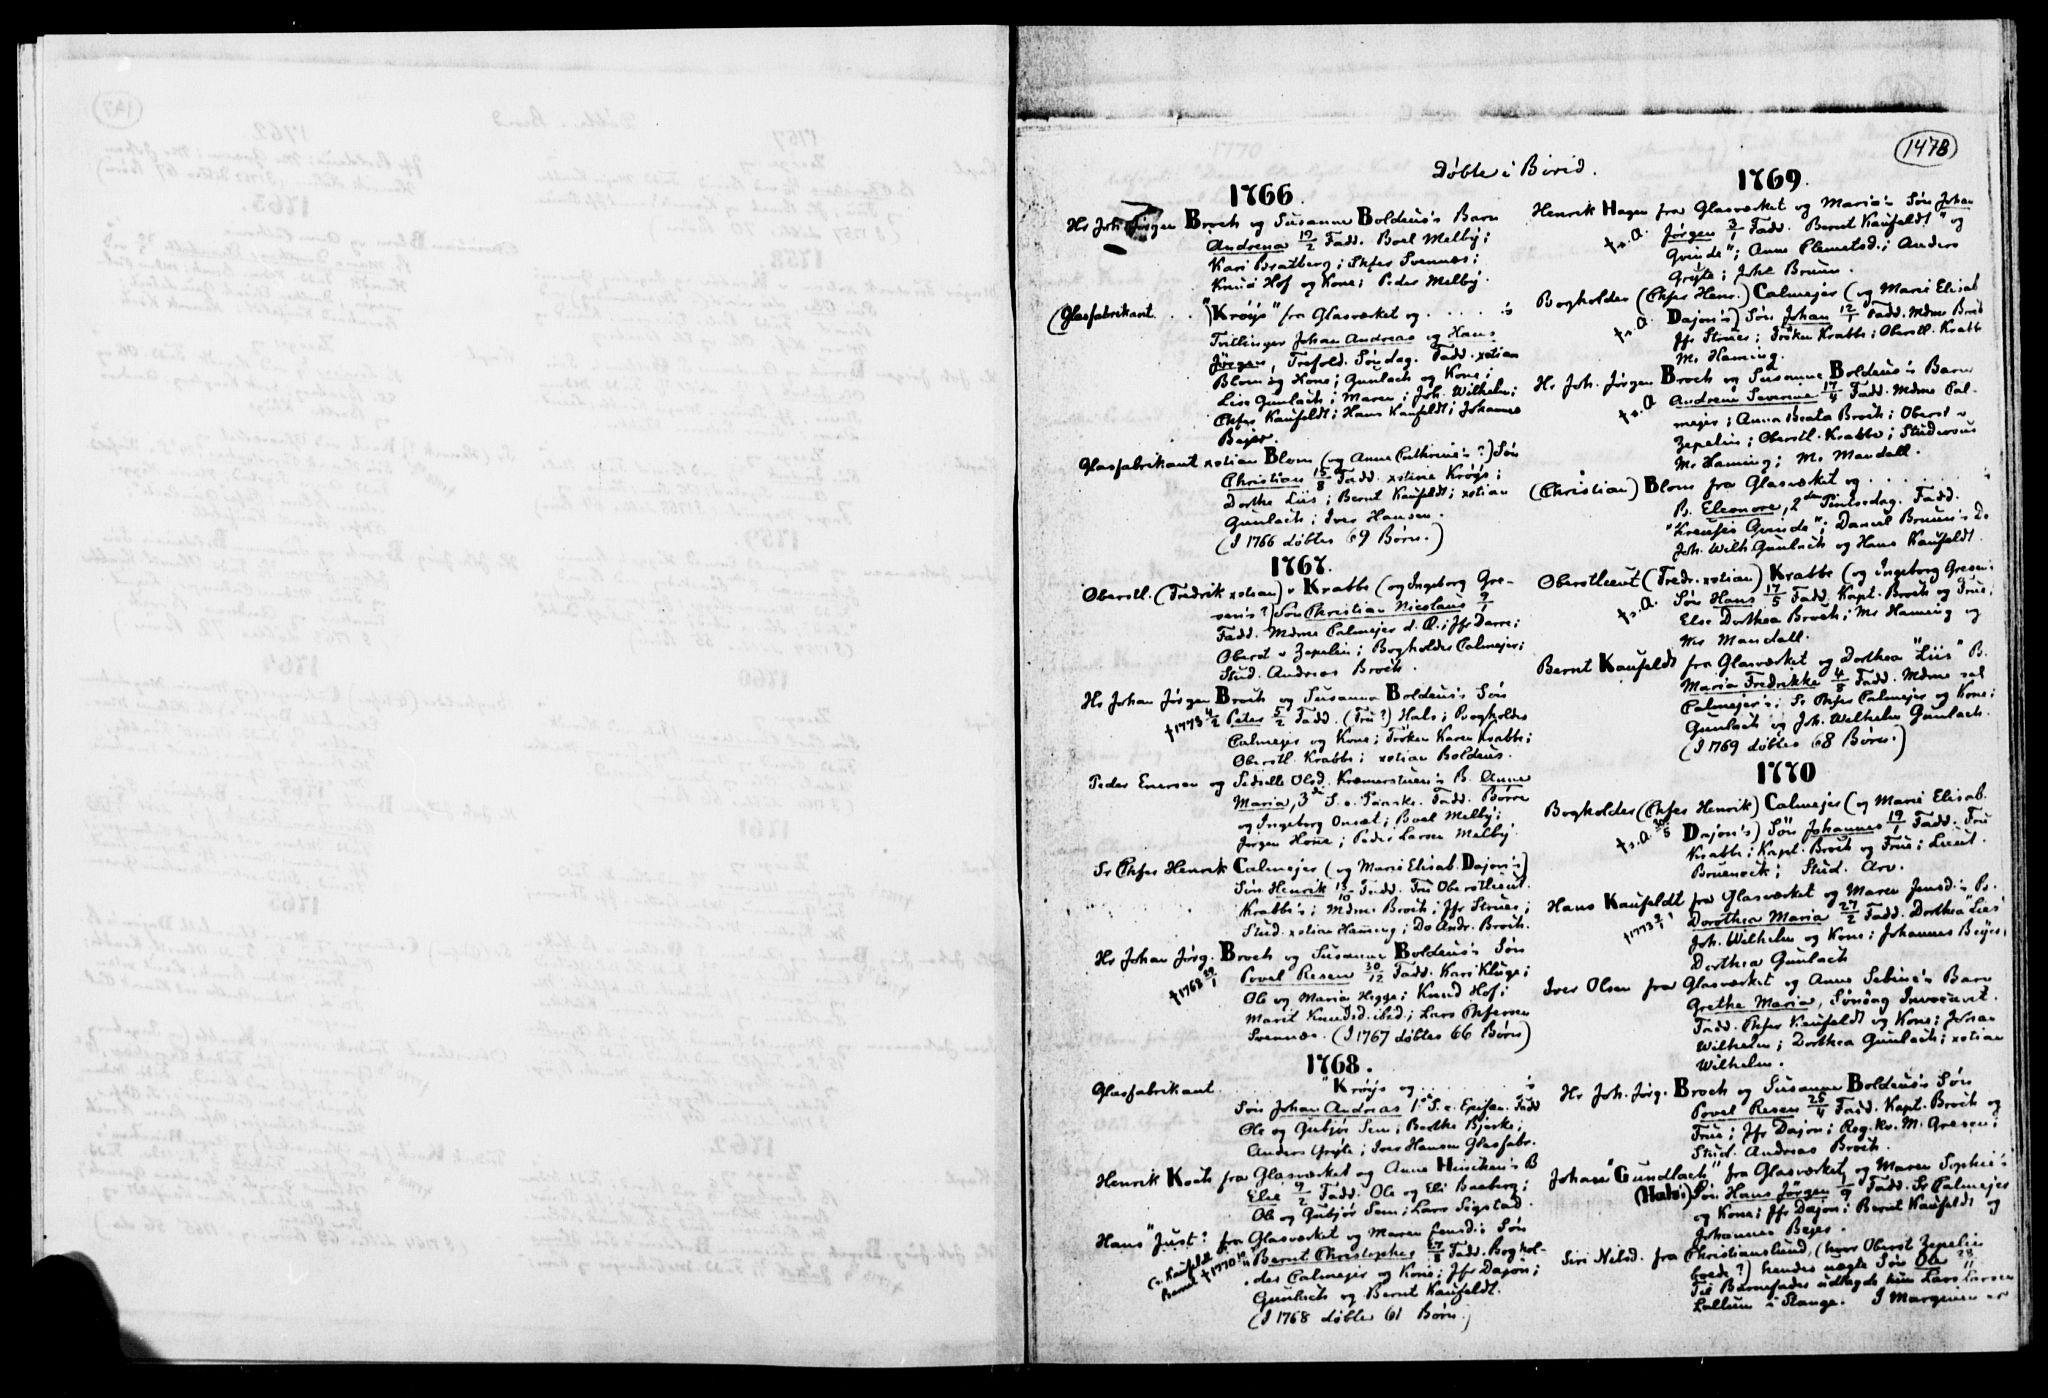 SAH, Biri prestekontor, Ministerialbok, 1730-1879, s. 147b